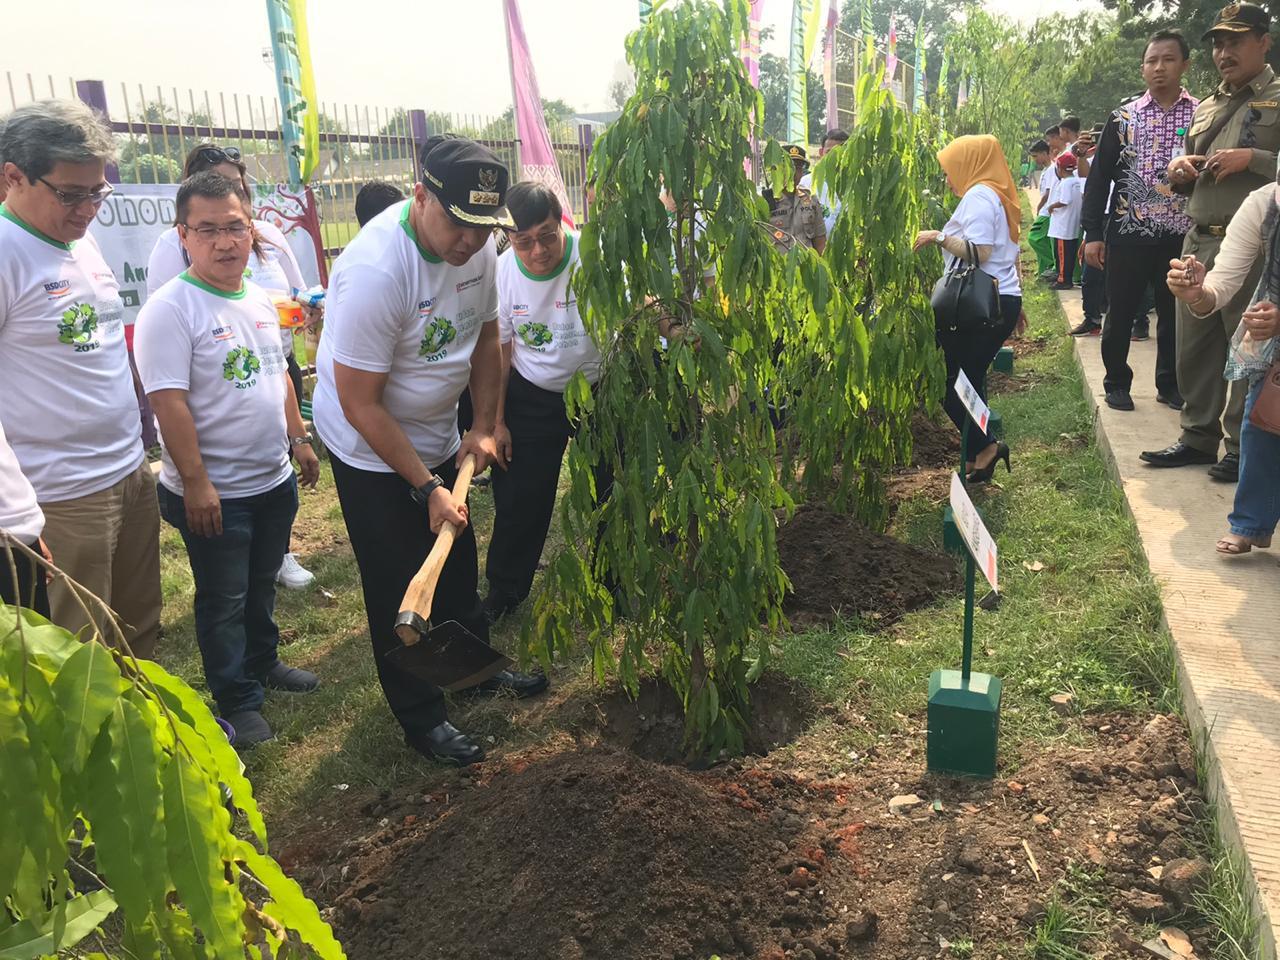 Bupati Tangerang Ahmed Zaki Iskandar didampingi Direktur PT Bumi Serpong Damai Tbk, Syukur Lawigena dan Direksi Sinar Mas Land saat menanam bibit pohon.